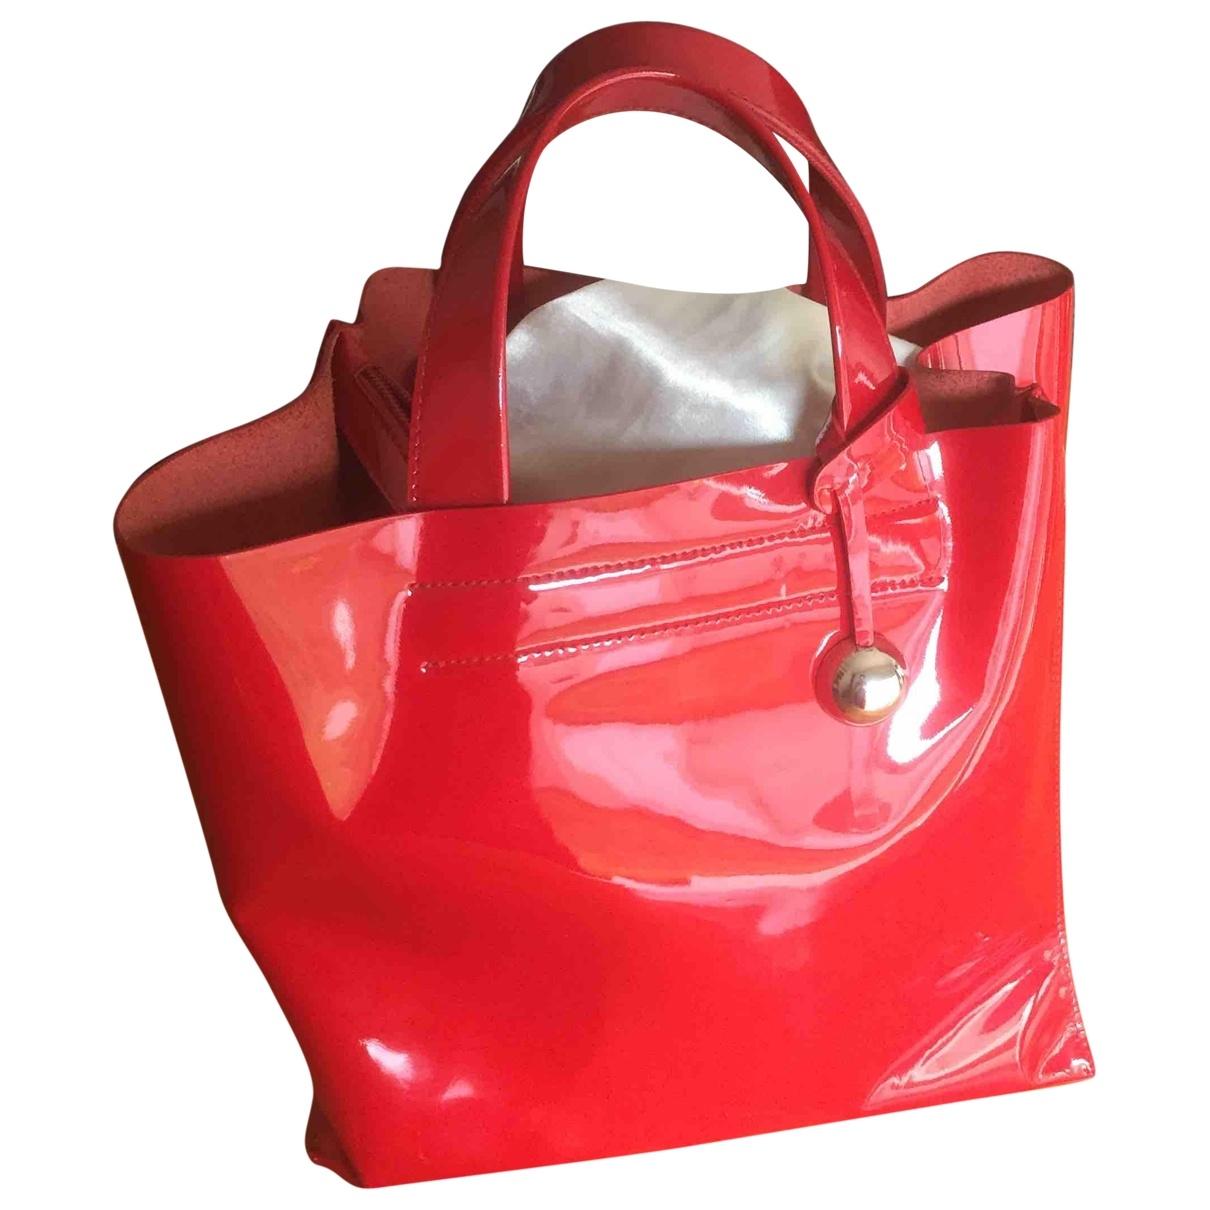 Furla \N Red Patent leather handbag for Women \N